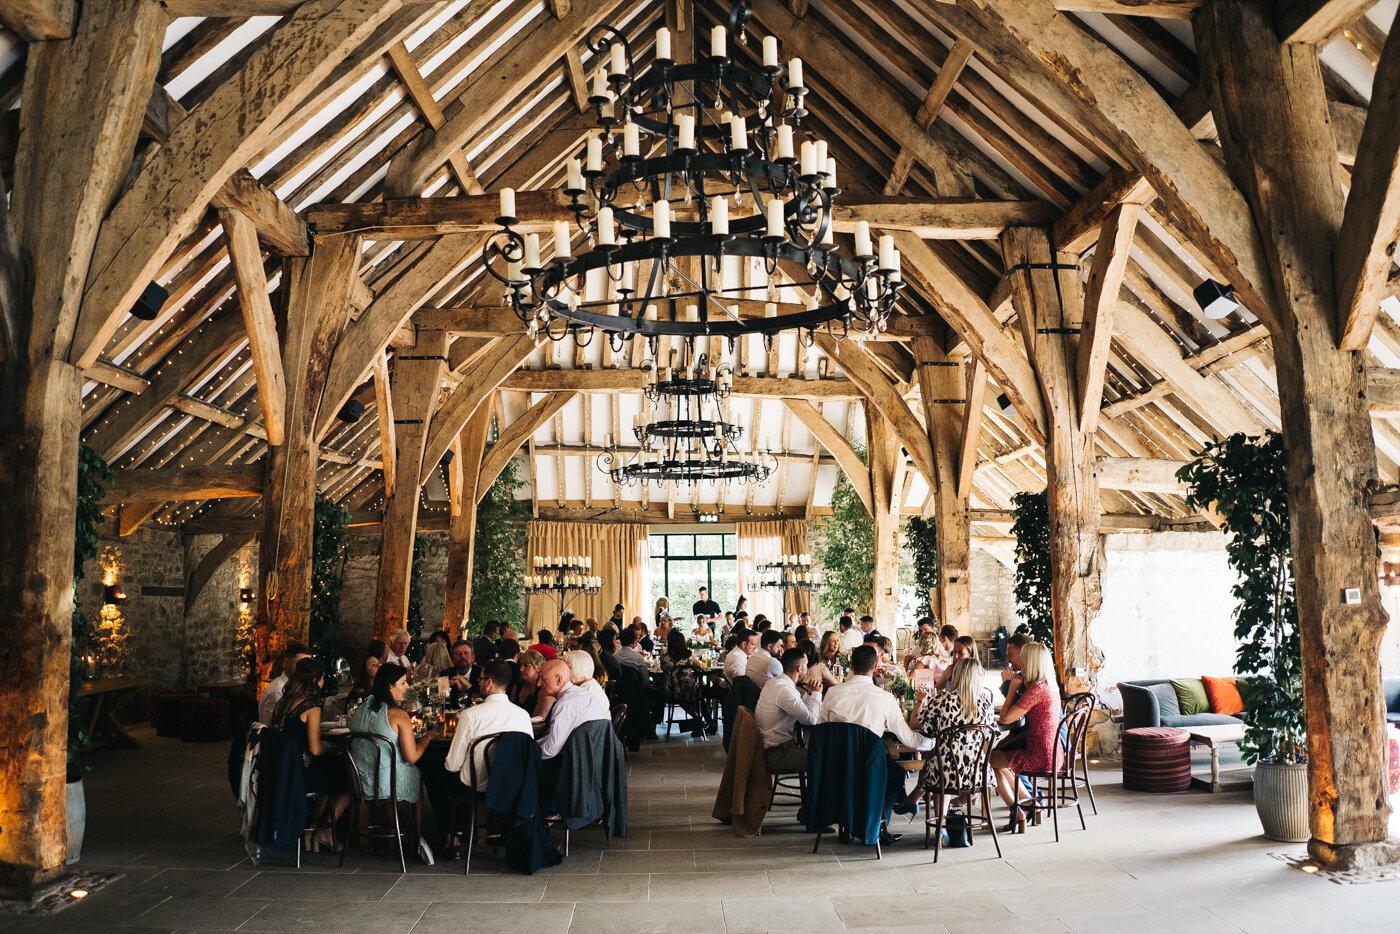 tithe-barn-bolton-abbey-north-yorkshire-cripps-wedding-photographer-creative-0044.jpg